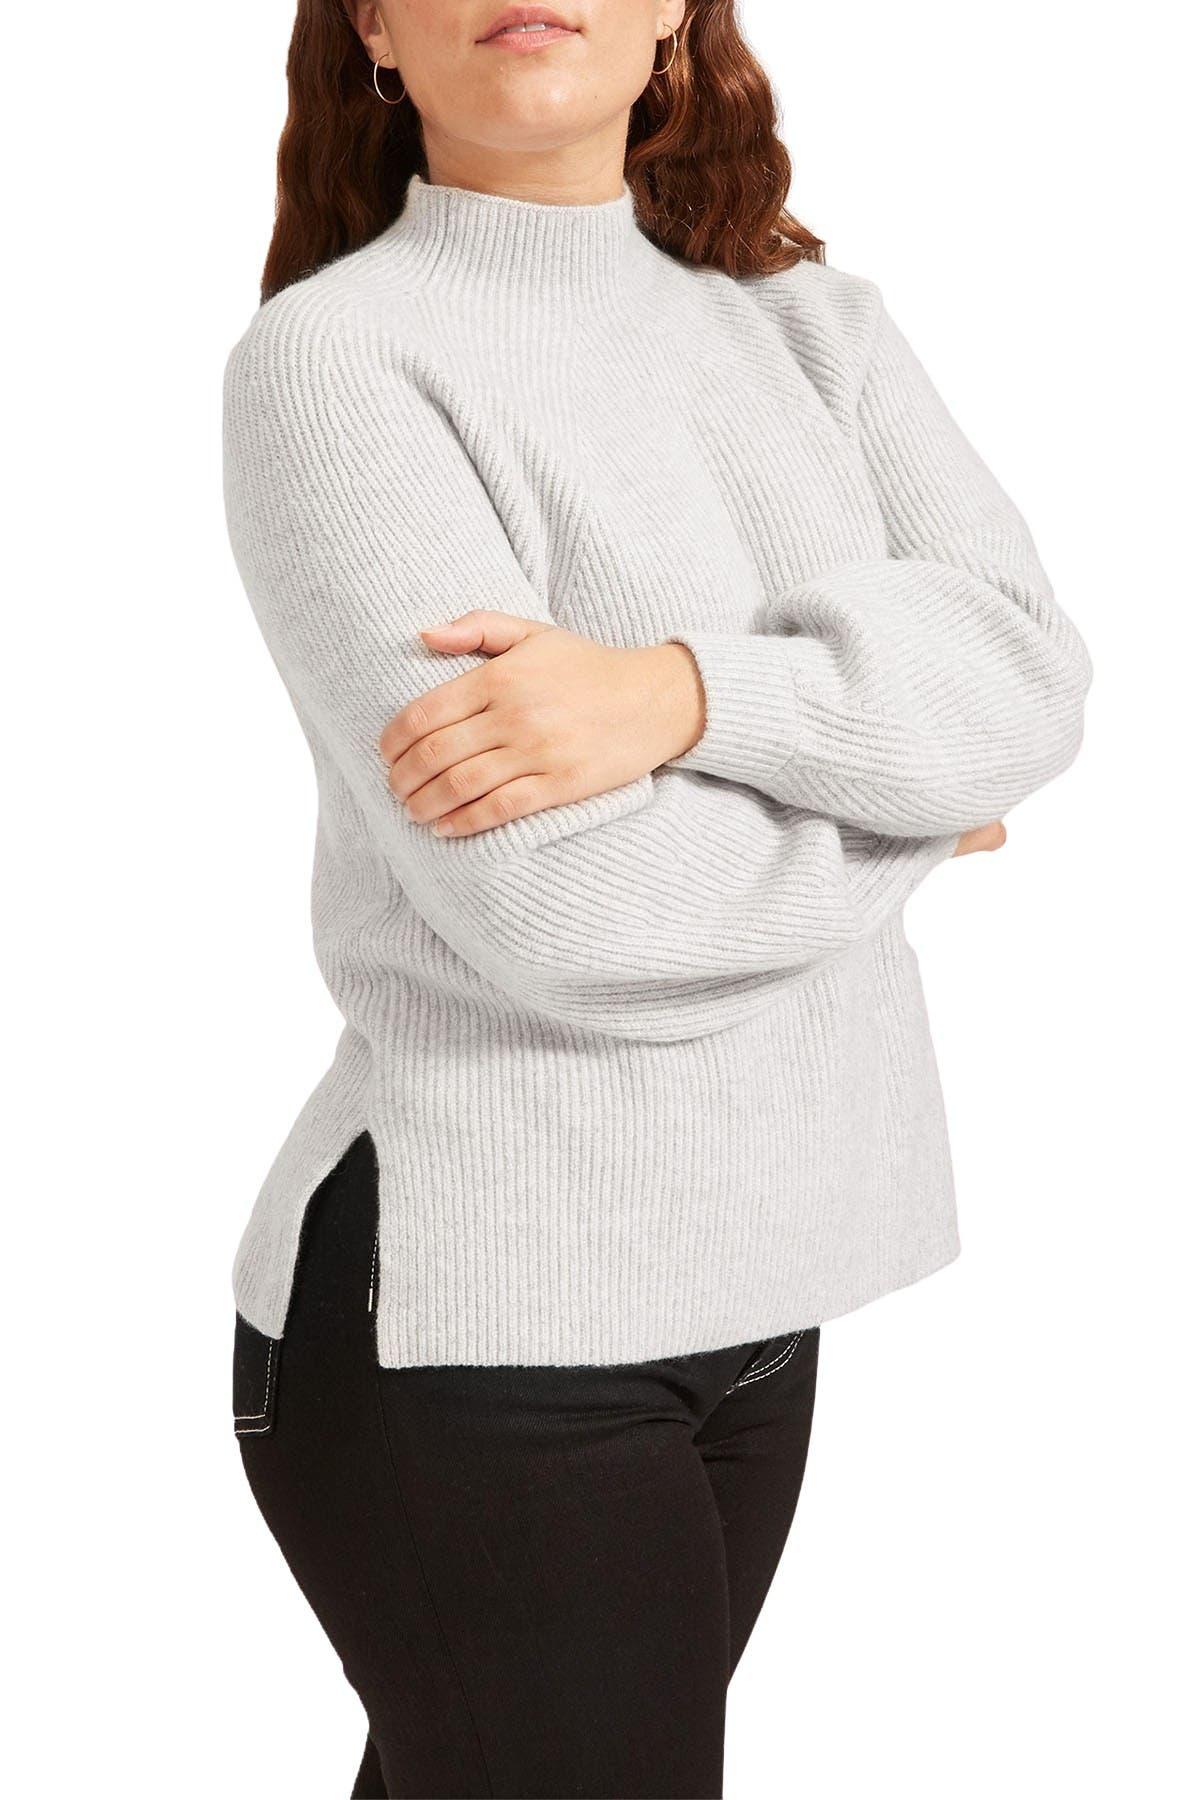 Image of EVERLANE The Premium Cashmere Mockneck